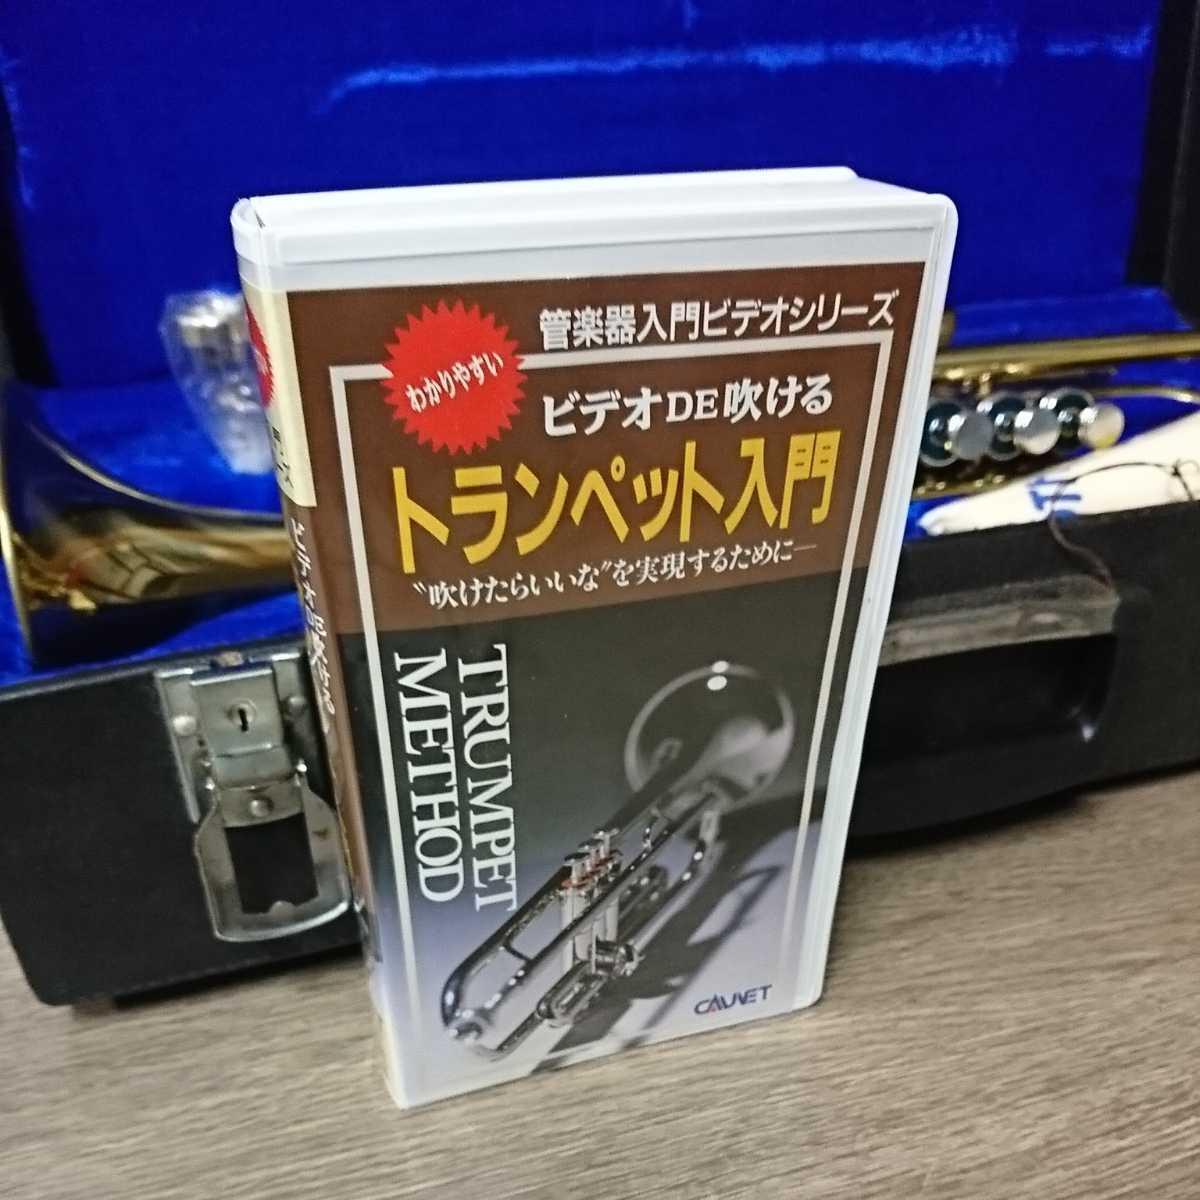 【B354】bestler ベスラー ハードケース付き トランペット ビデオ付き_画像8